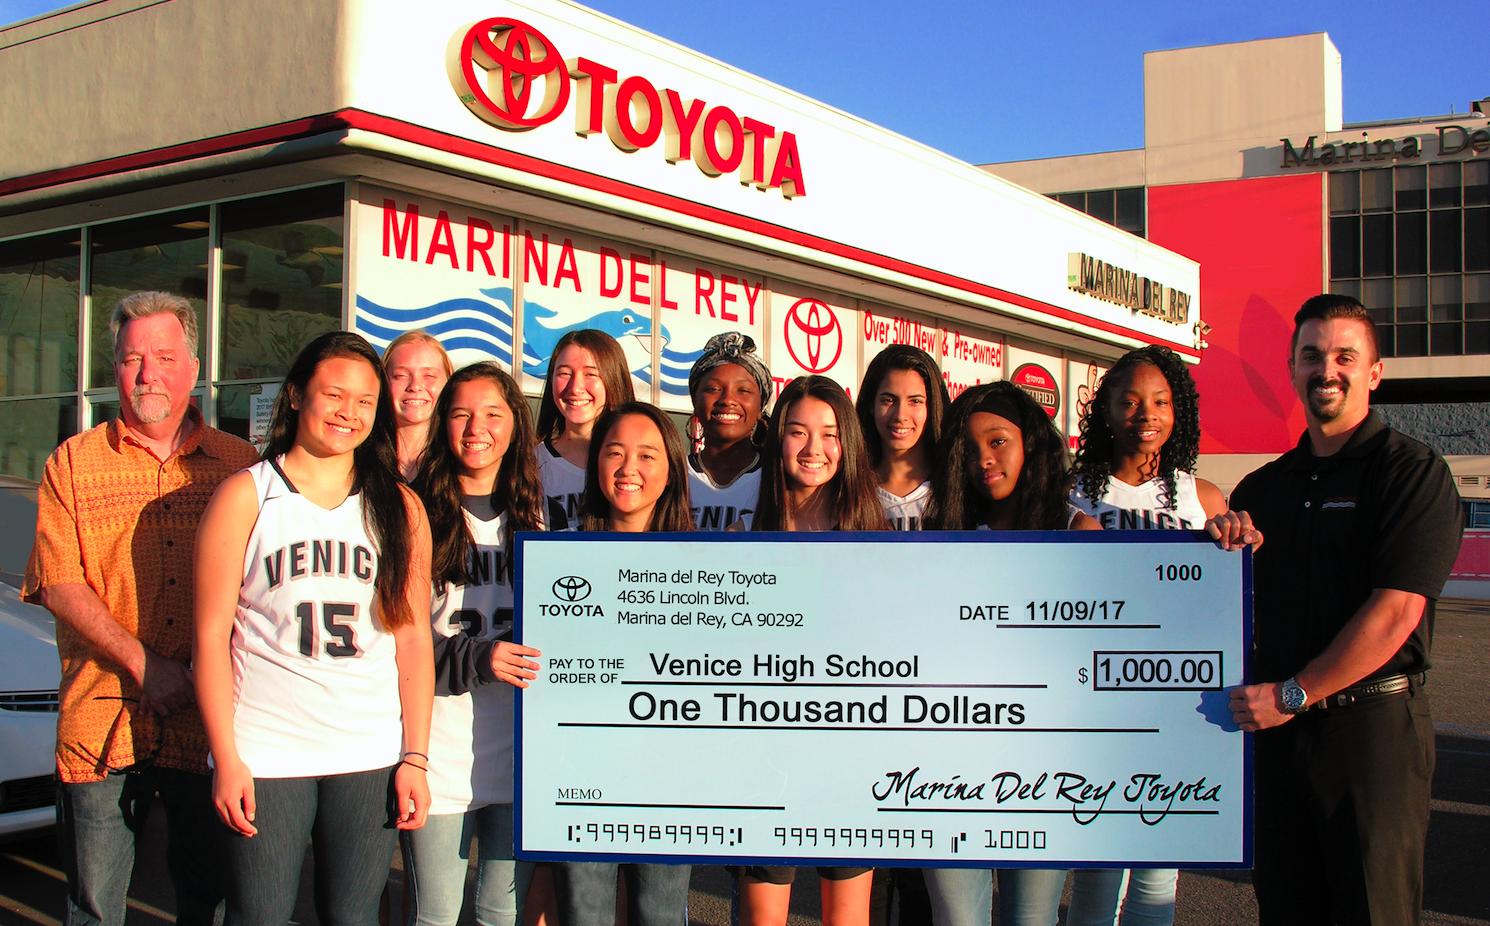 Marina Del Rey Toyota Sponsors Local High School Basketball Team